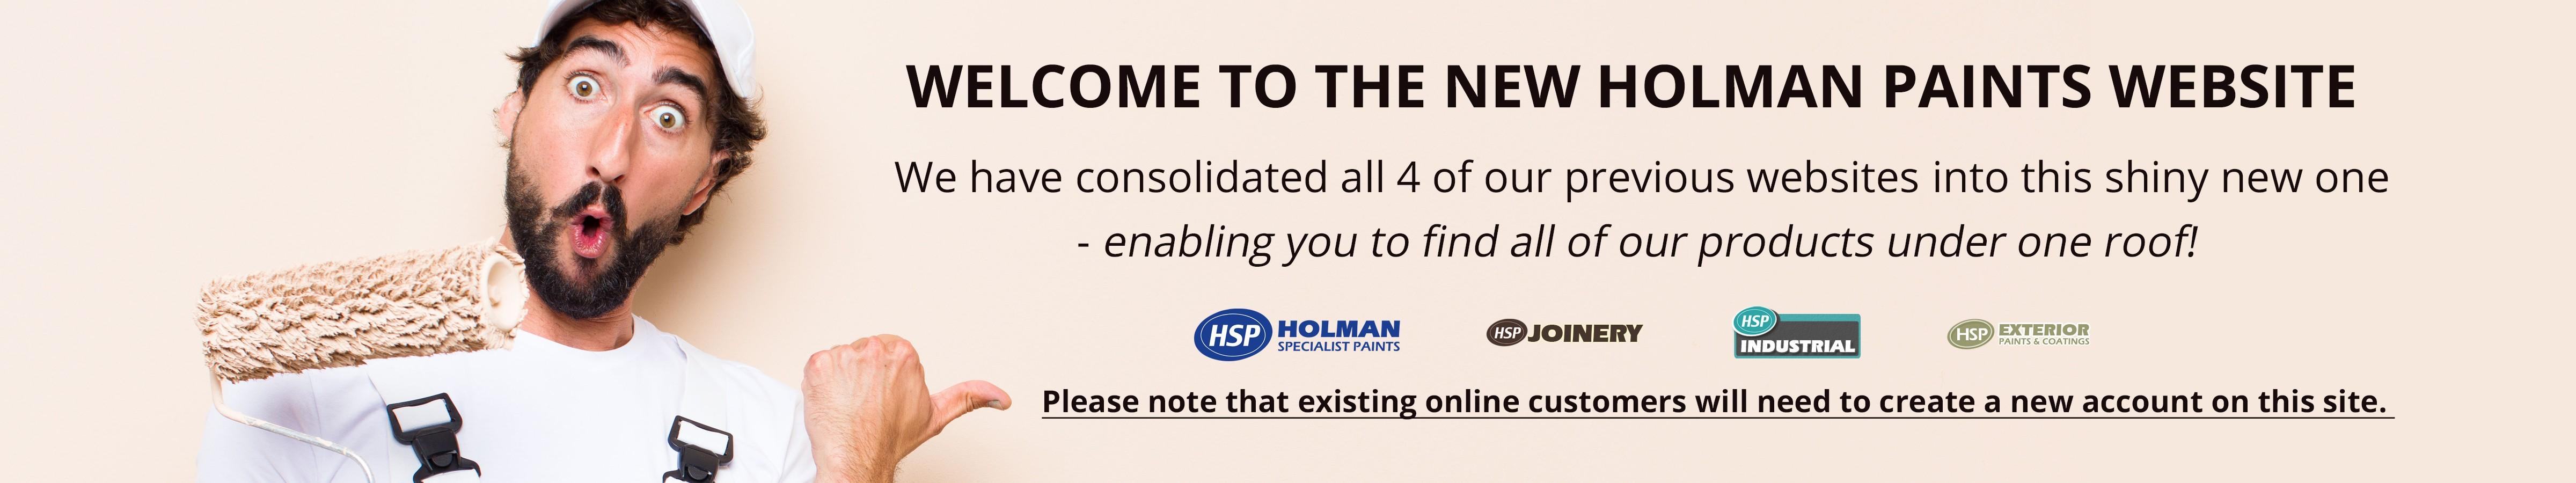 New Holman Paints Website